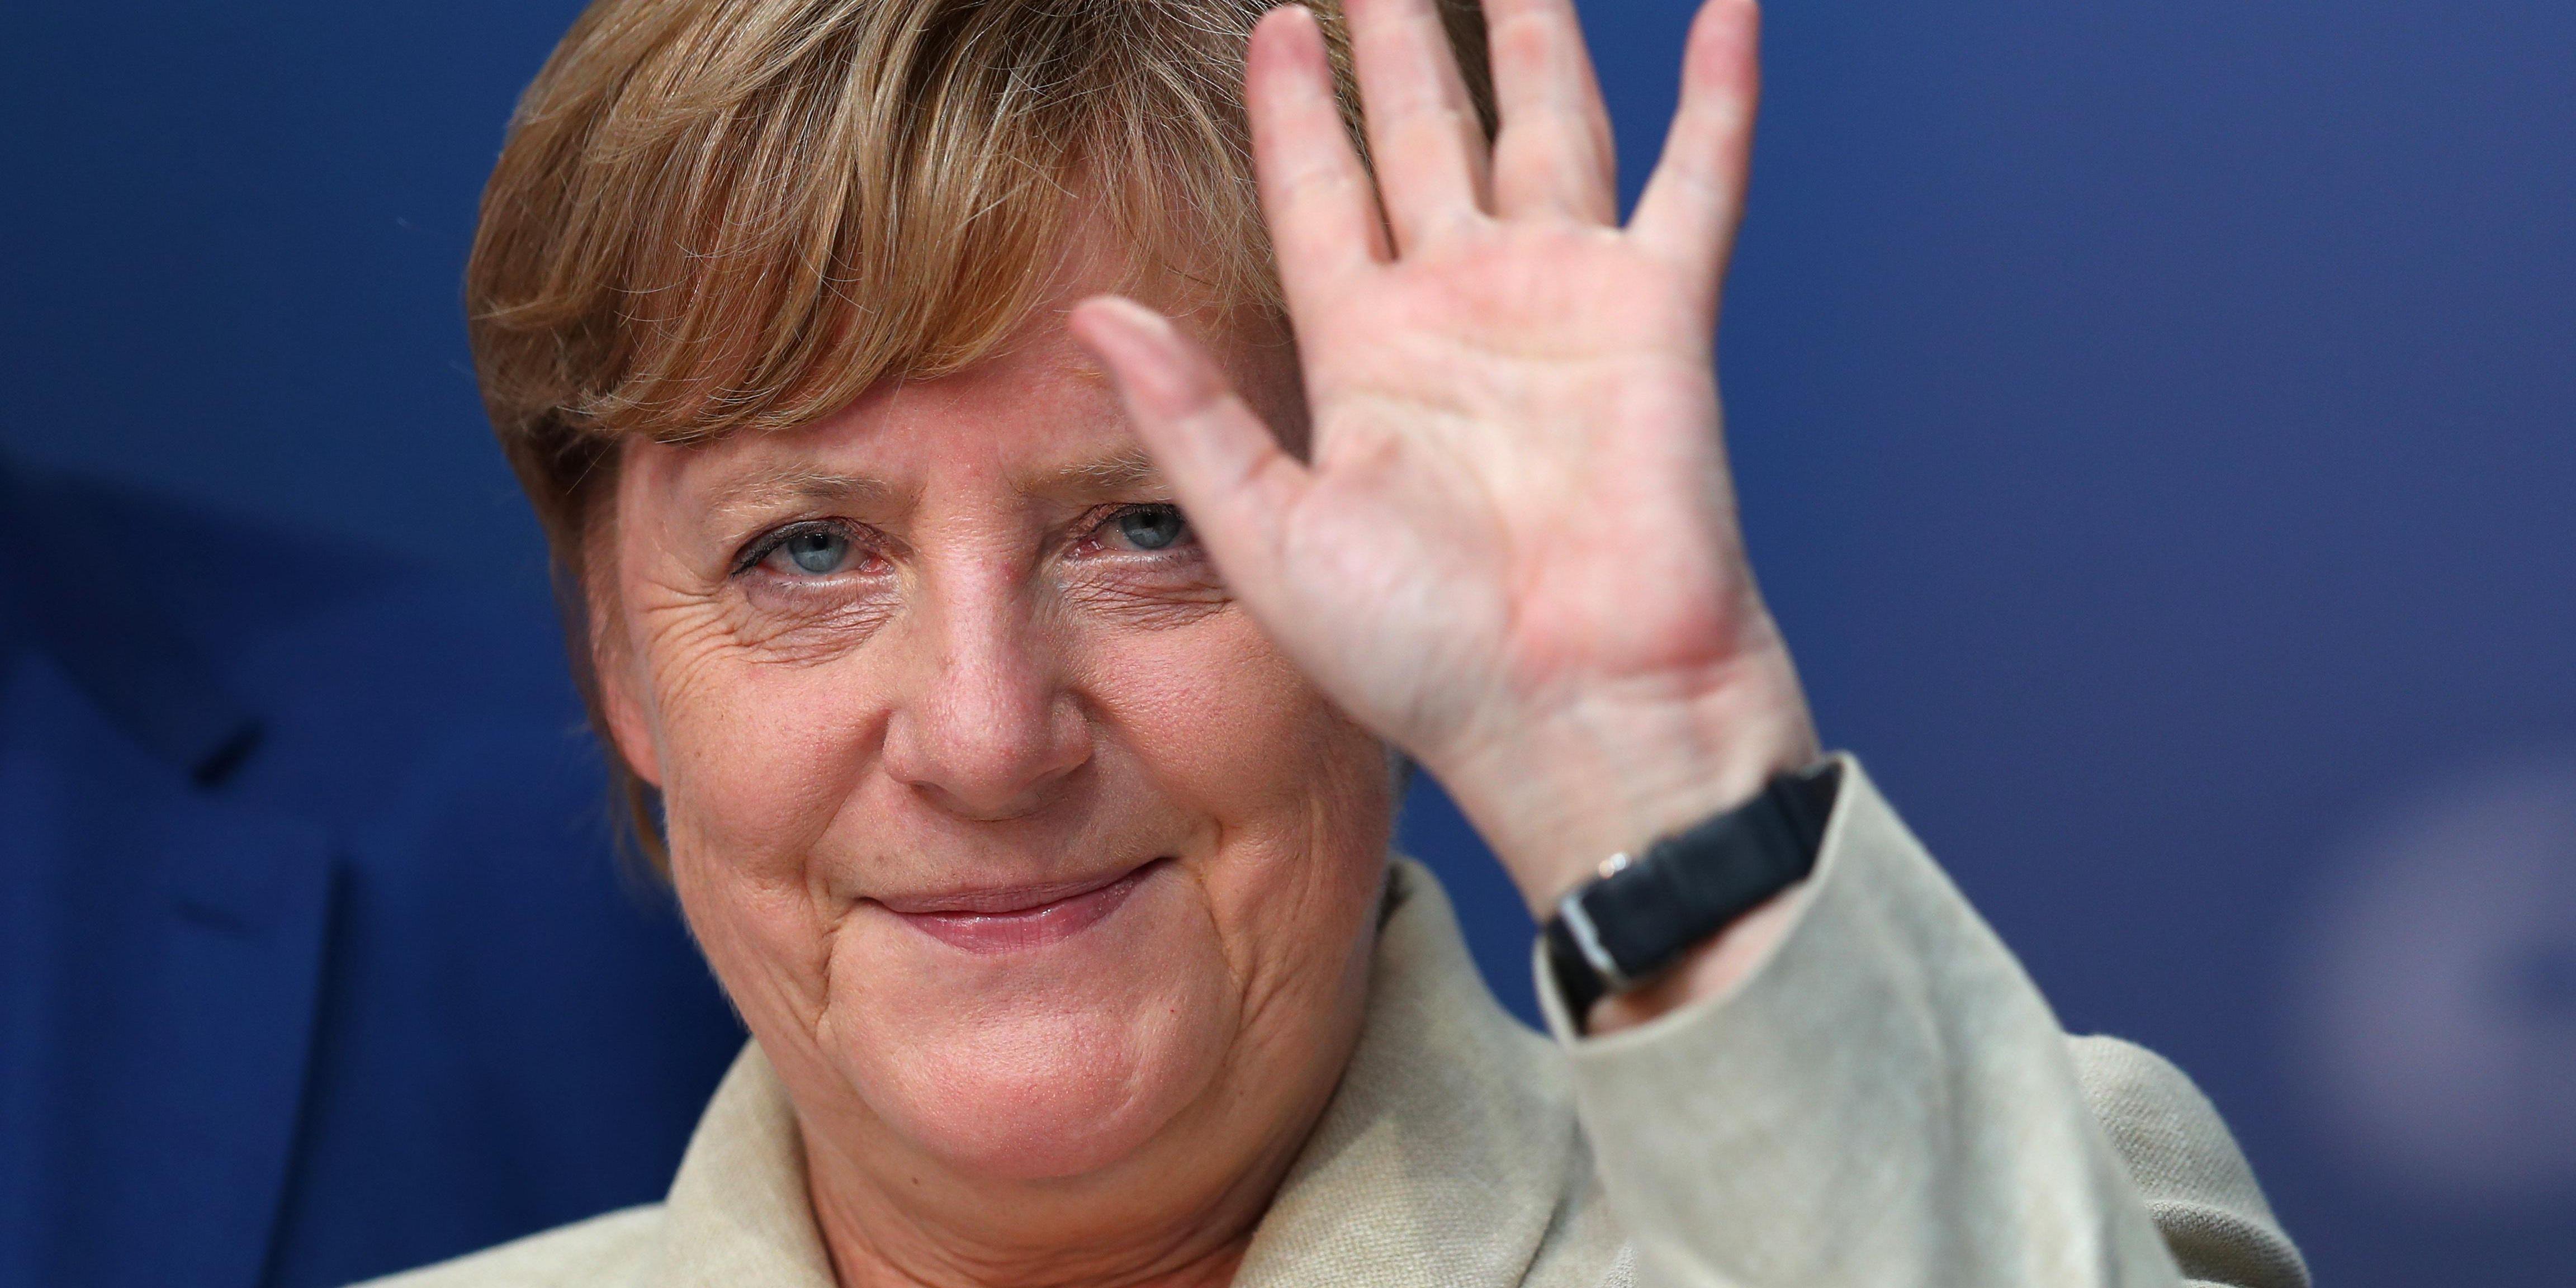 Angela Merkel: Germany's Global Cover Story For 16 Years